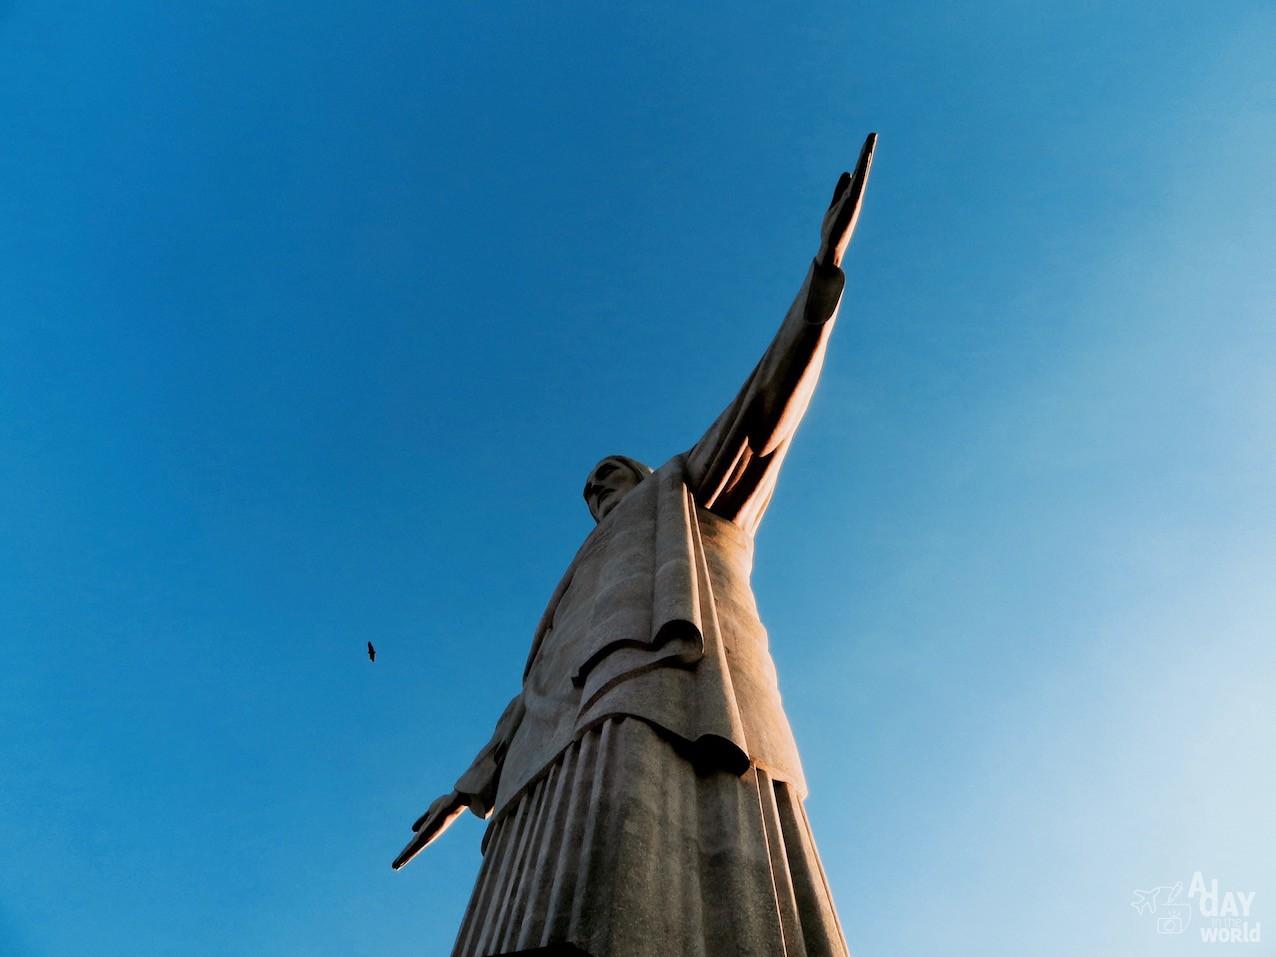 Corcovado City Guide Rio de Janeiro